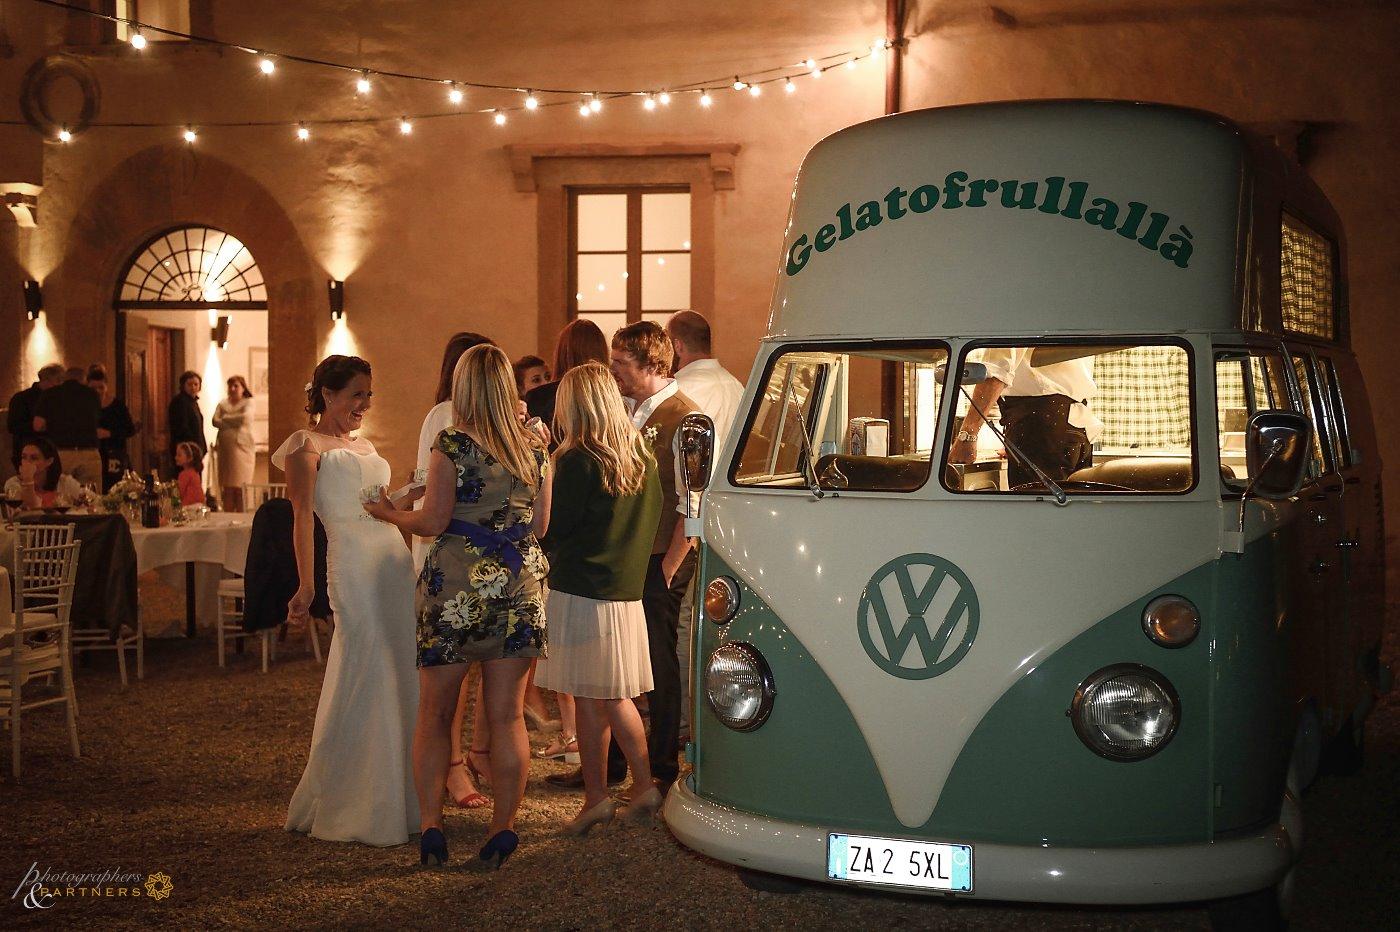 photo_weddings_castelfalfi_21.jpg